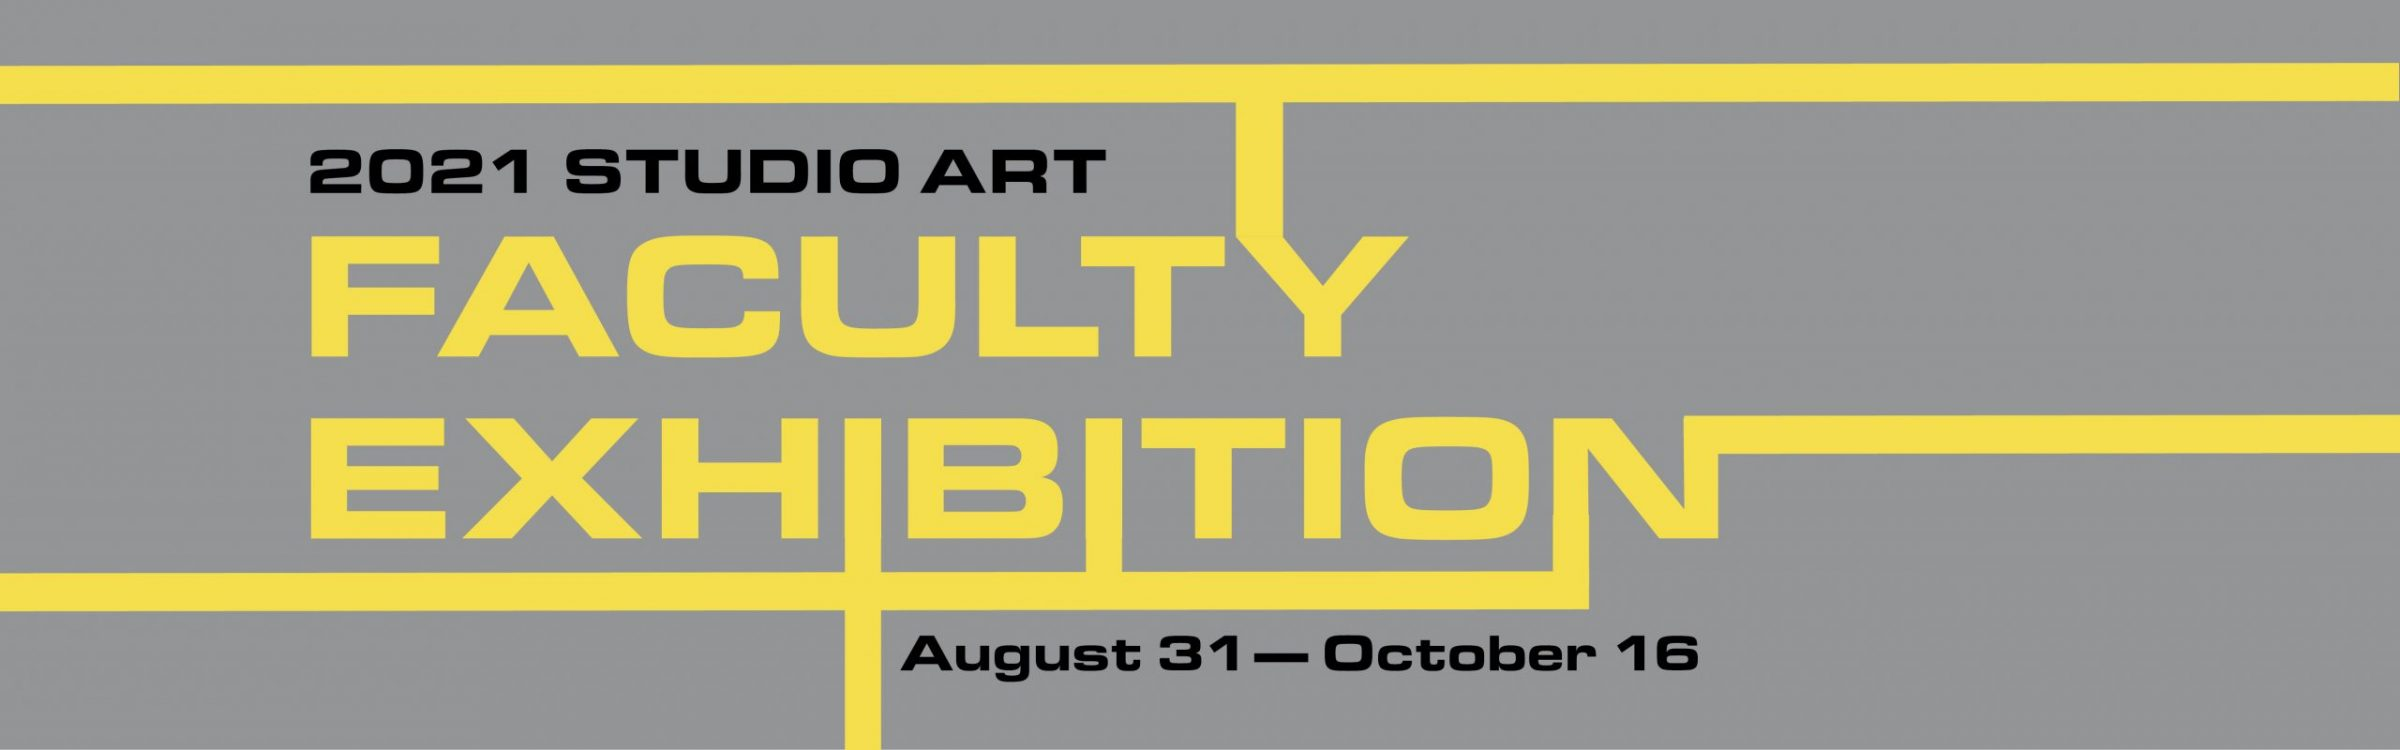 2021 Studio Art Faculty Exhibition graphic